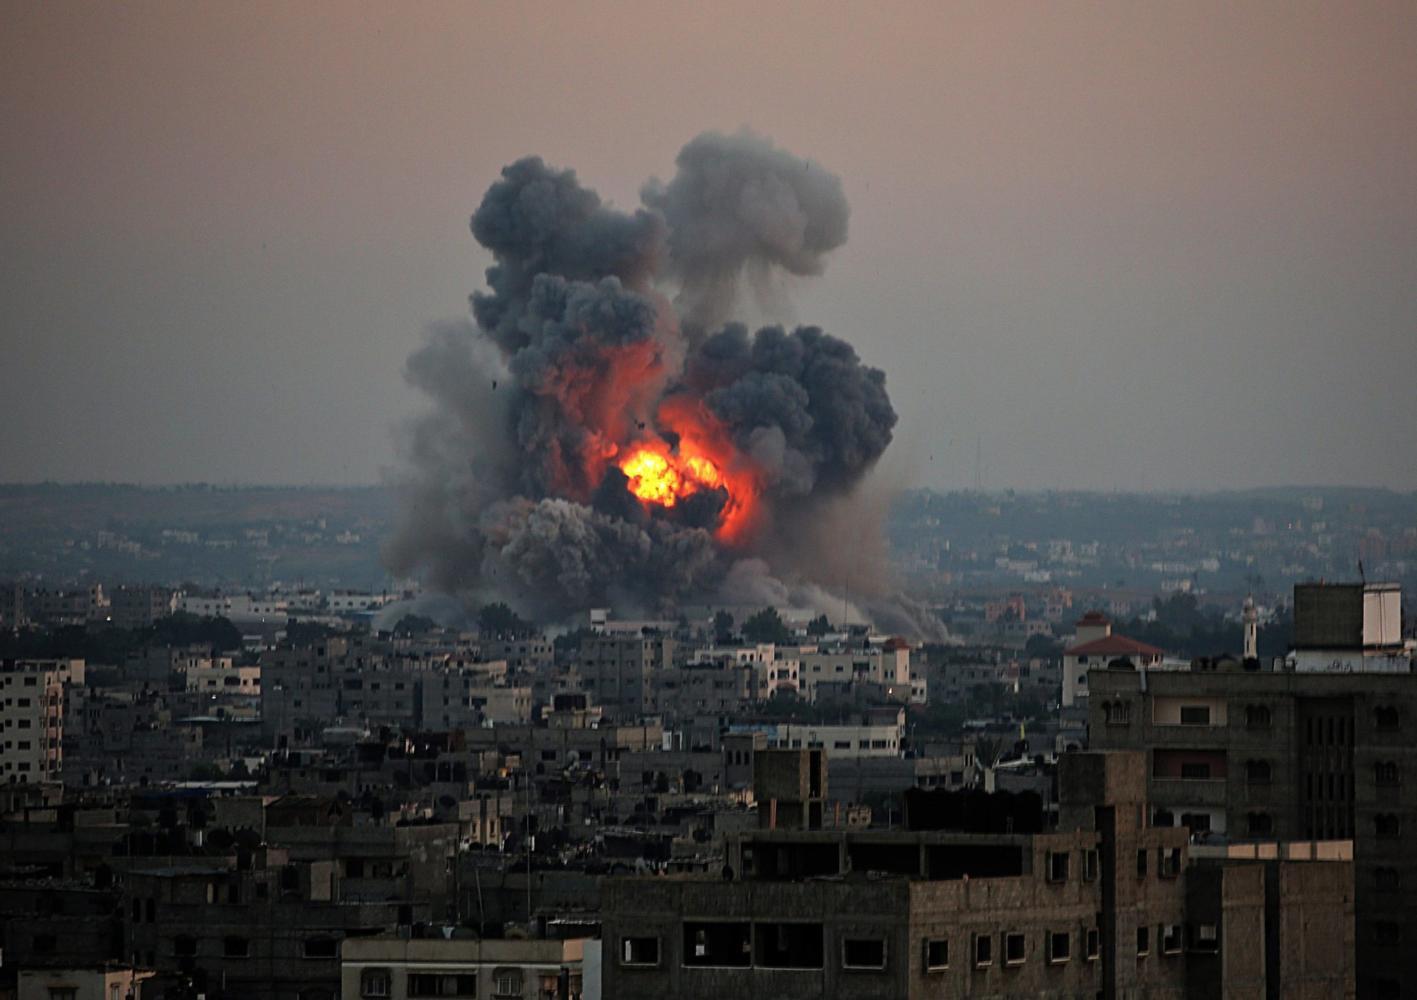 Trouble in Gaza